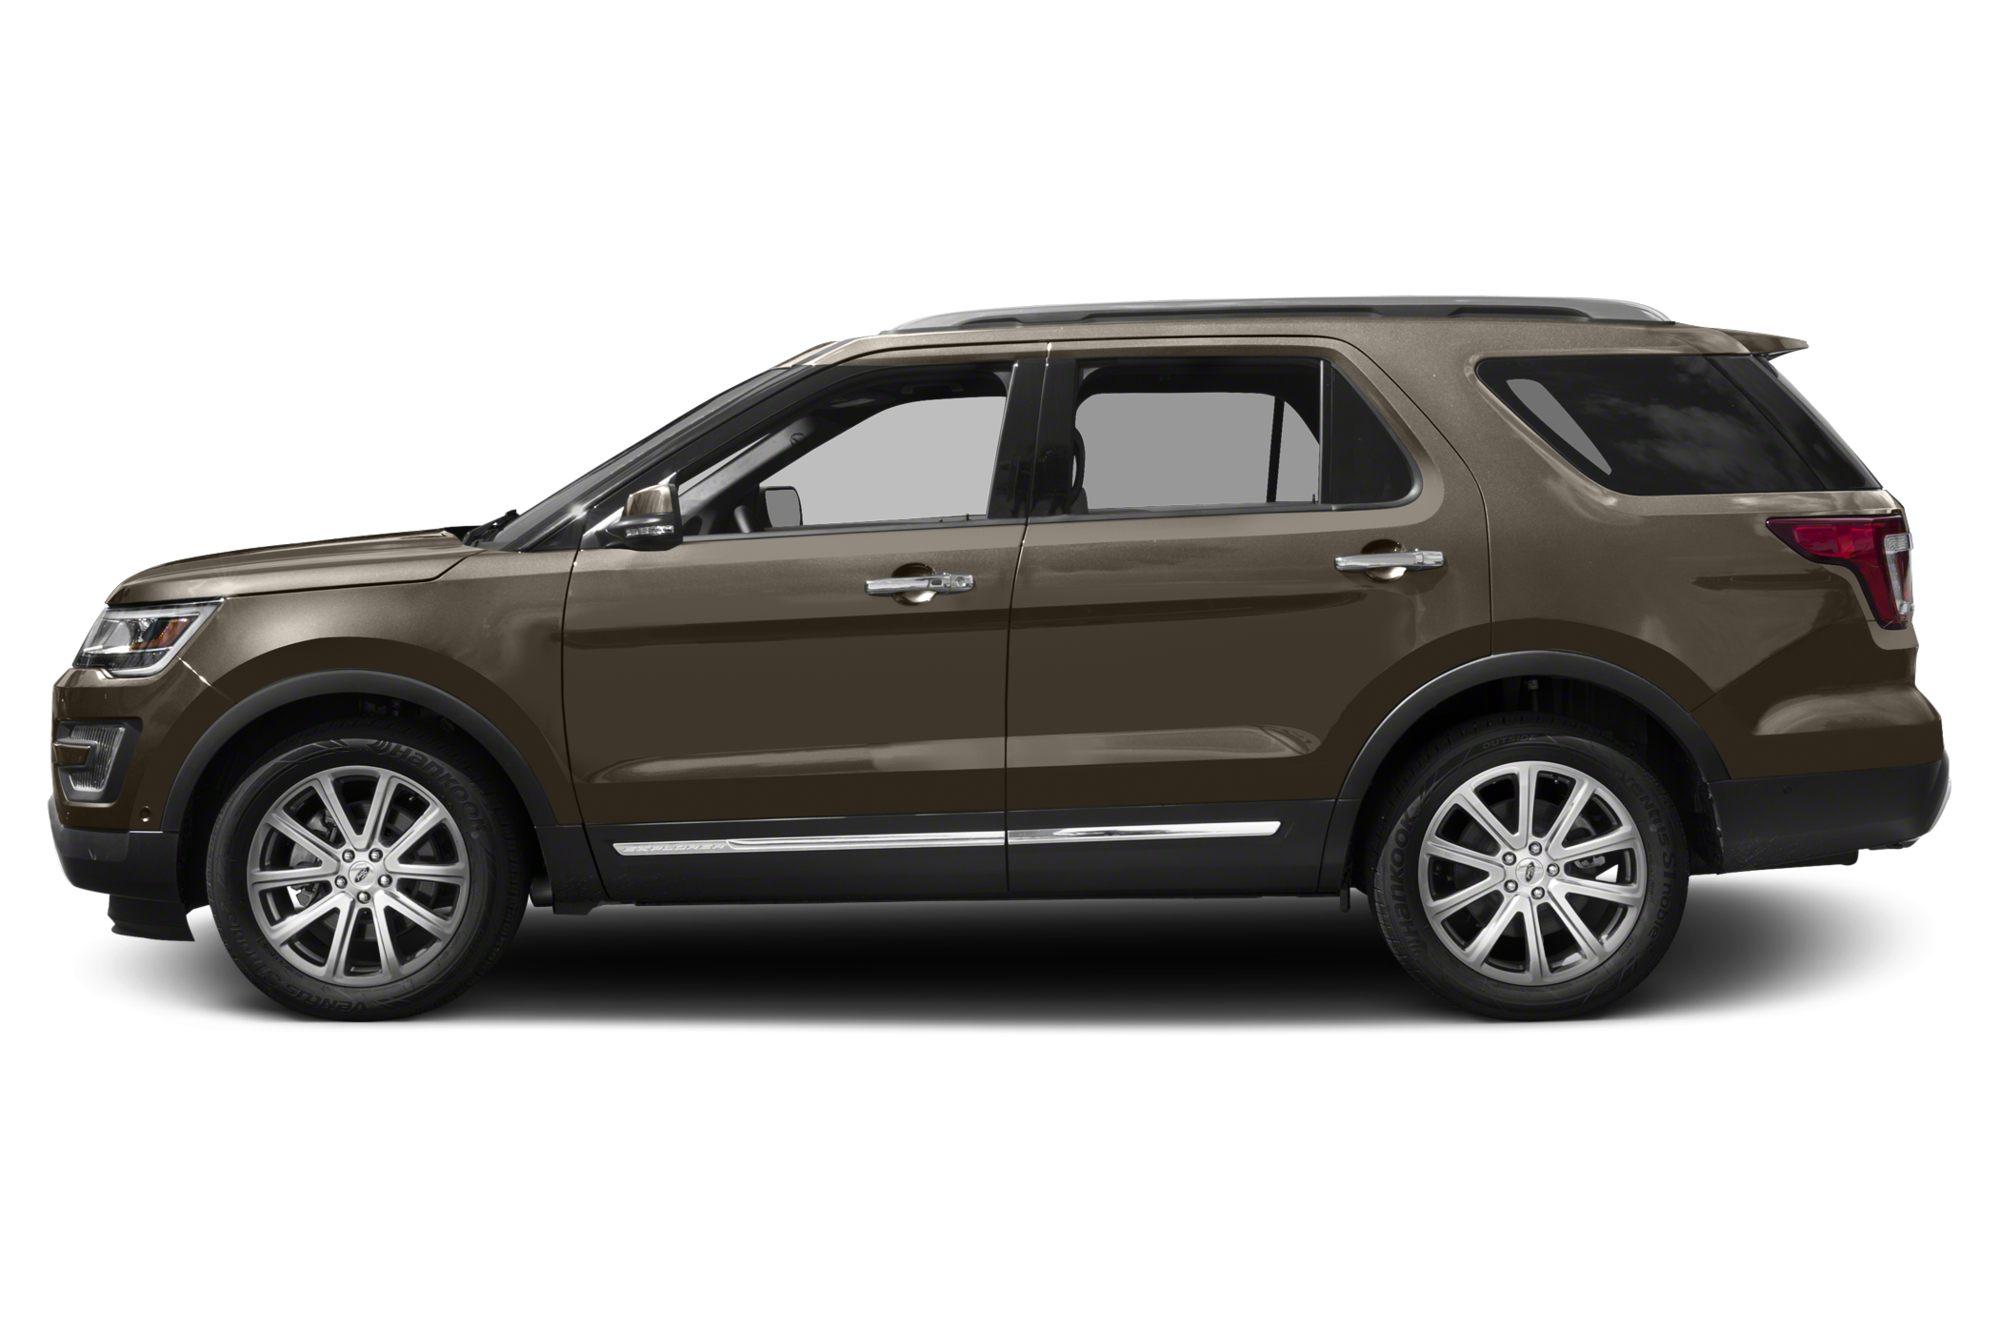 2017 Ford Explorer: Recall Alert